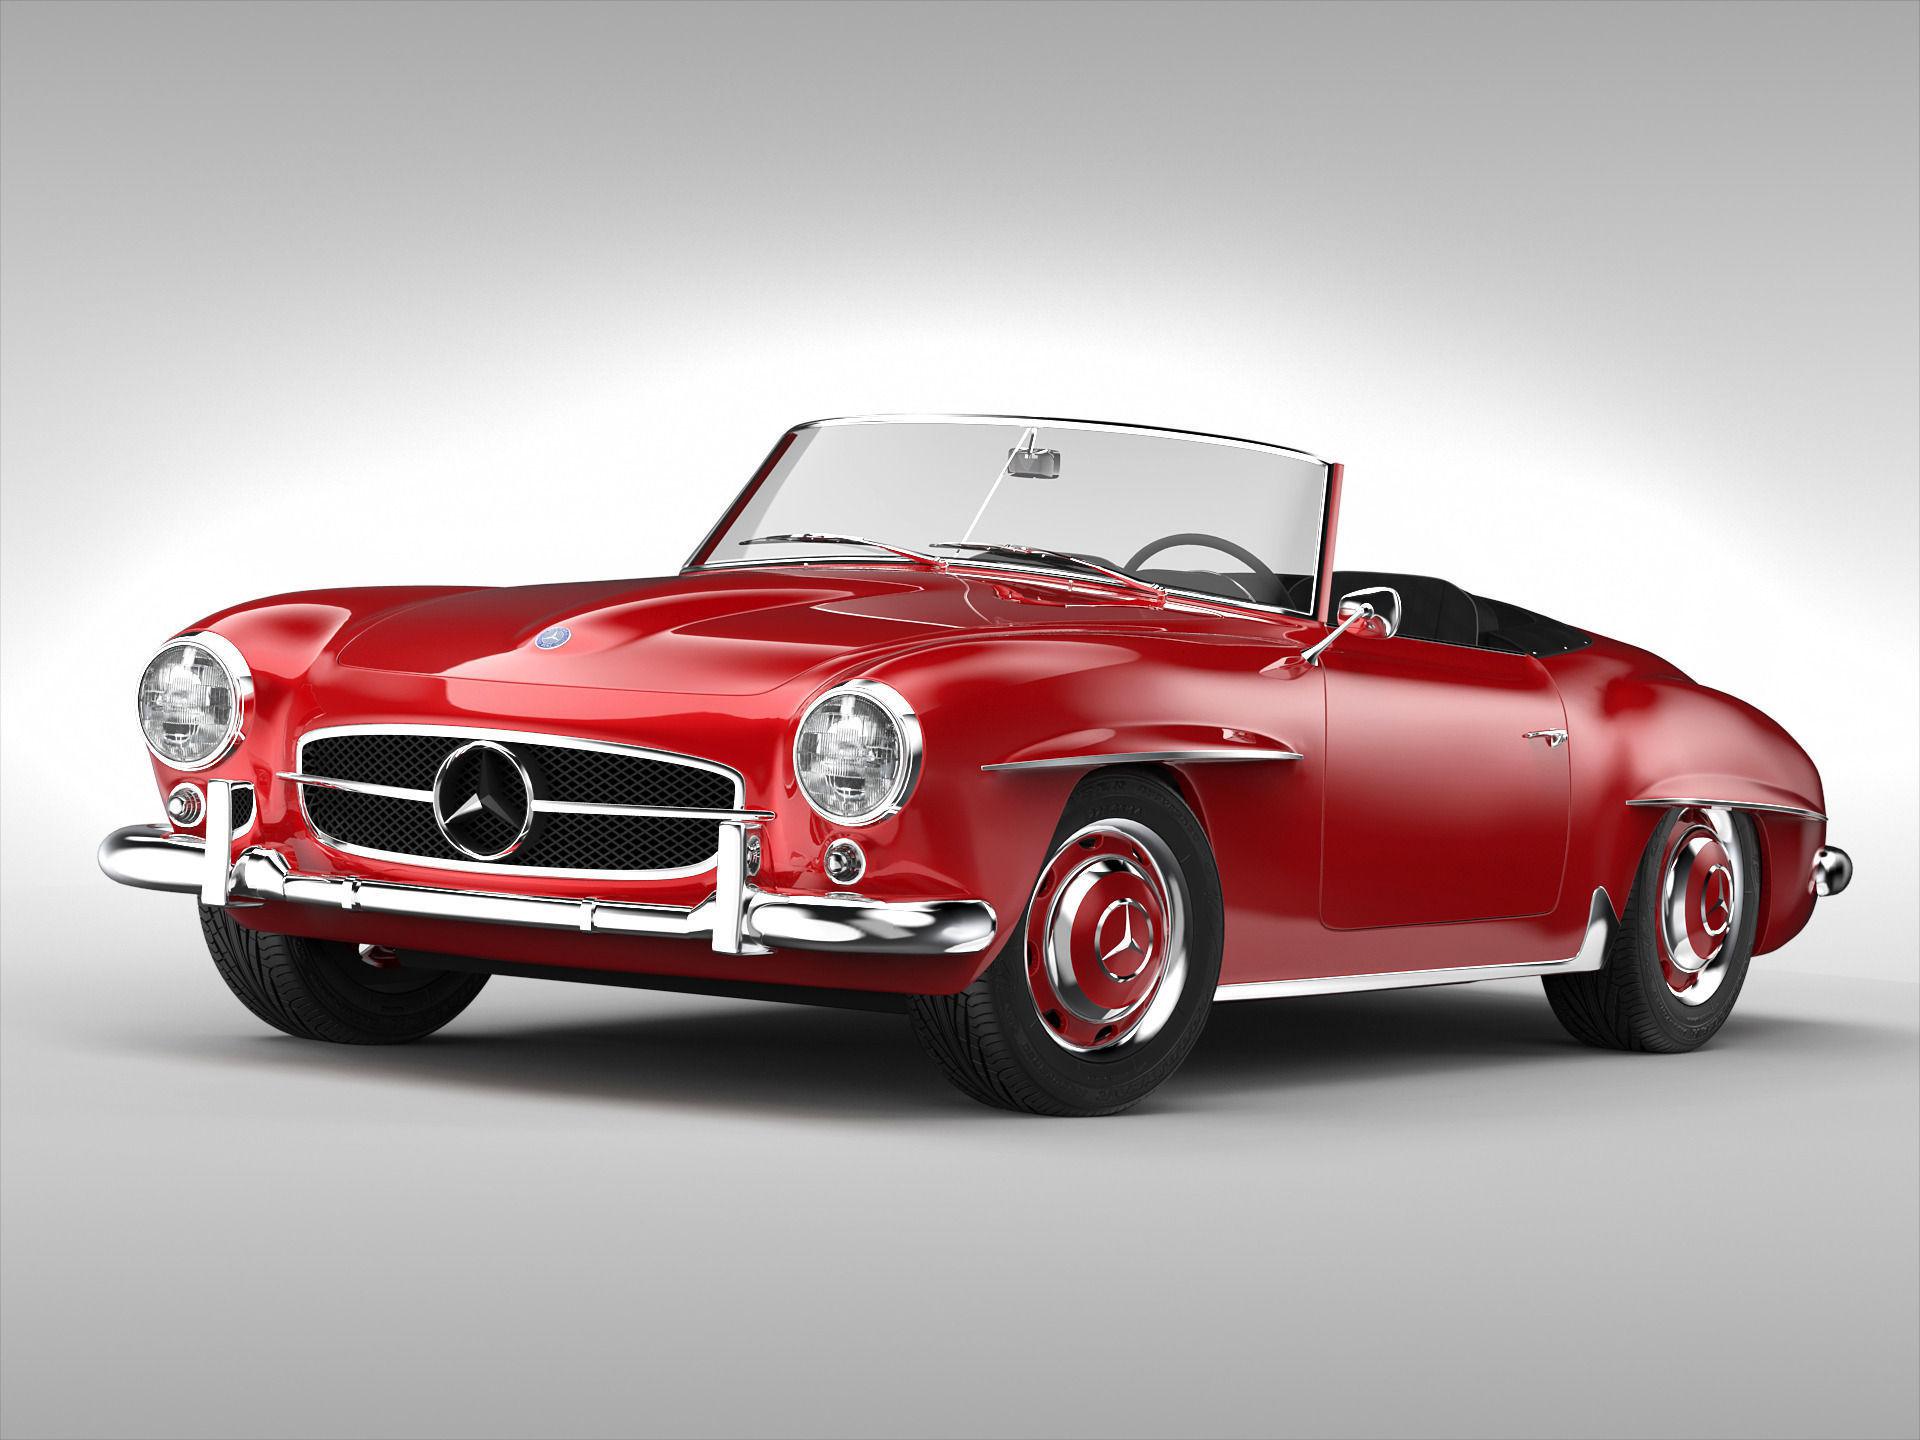 Mercedes-Benz SL-klasse I (R121) 1955 - 1963 Roadster #3